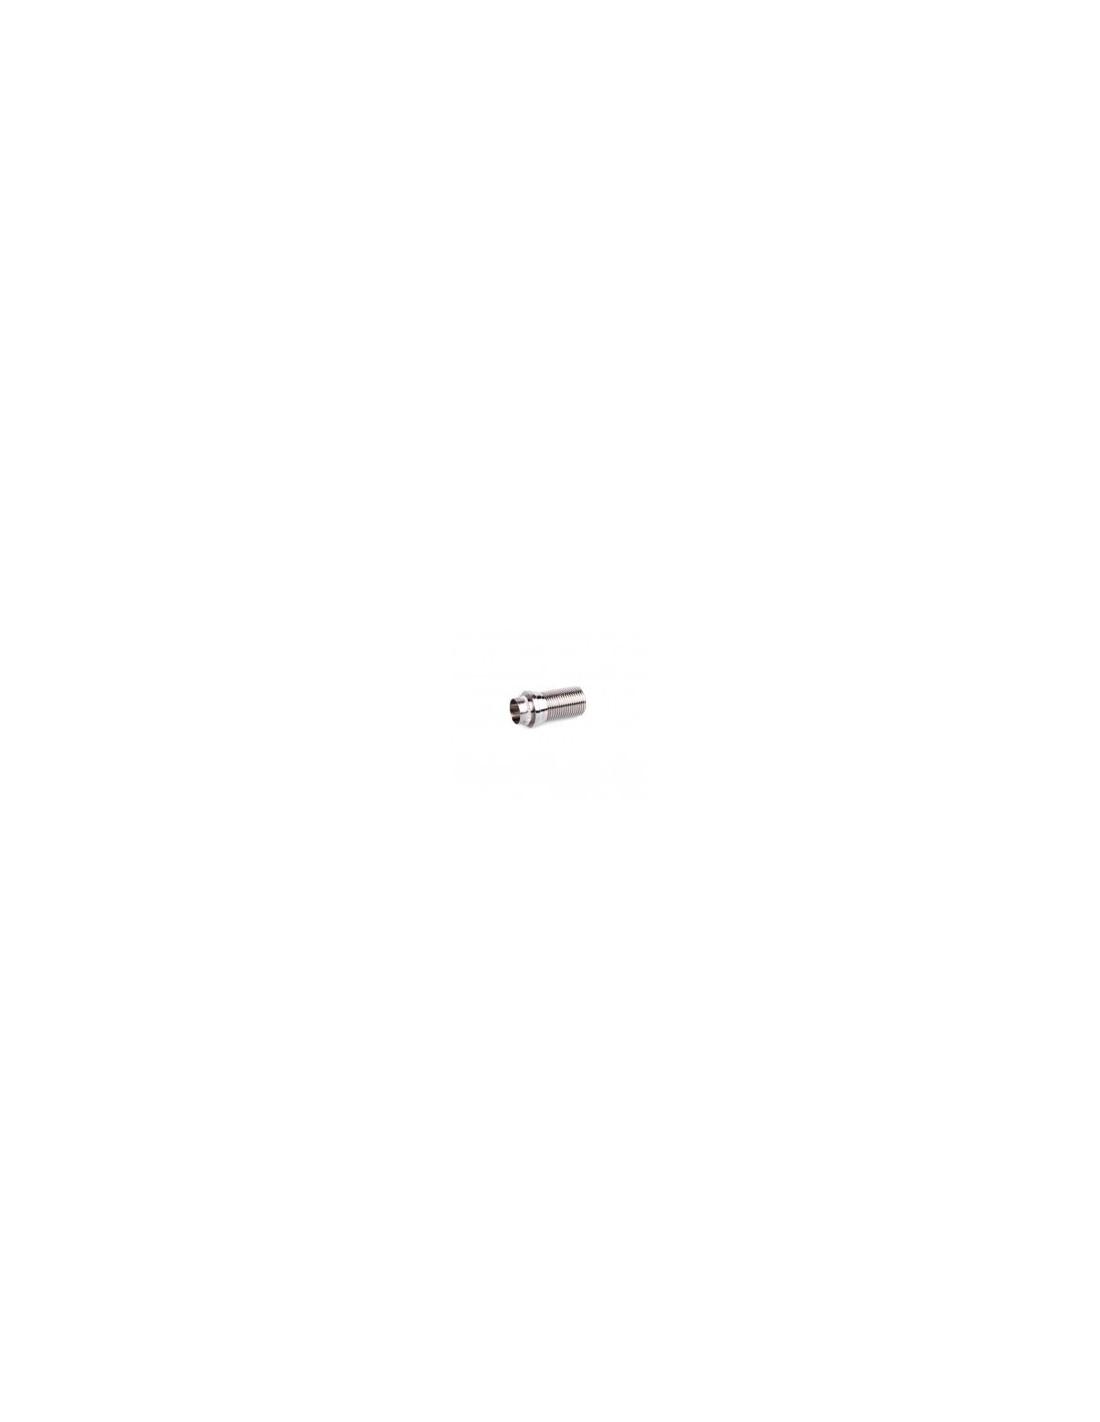 KOH01078 - Backpiece (shank) to beer tap 35mm (15)